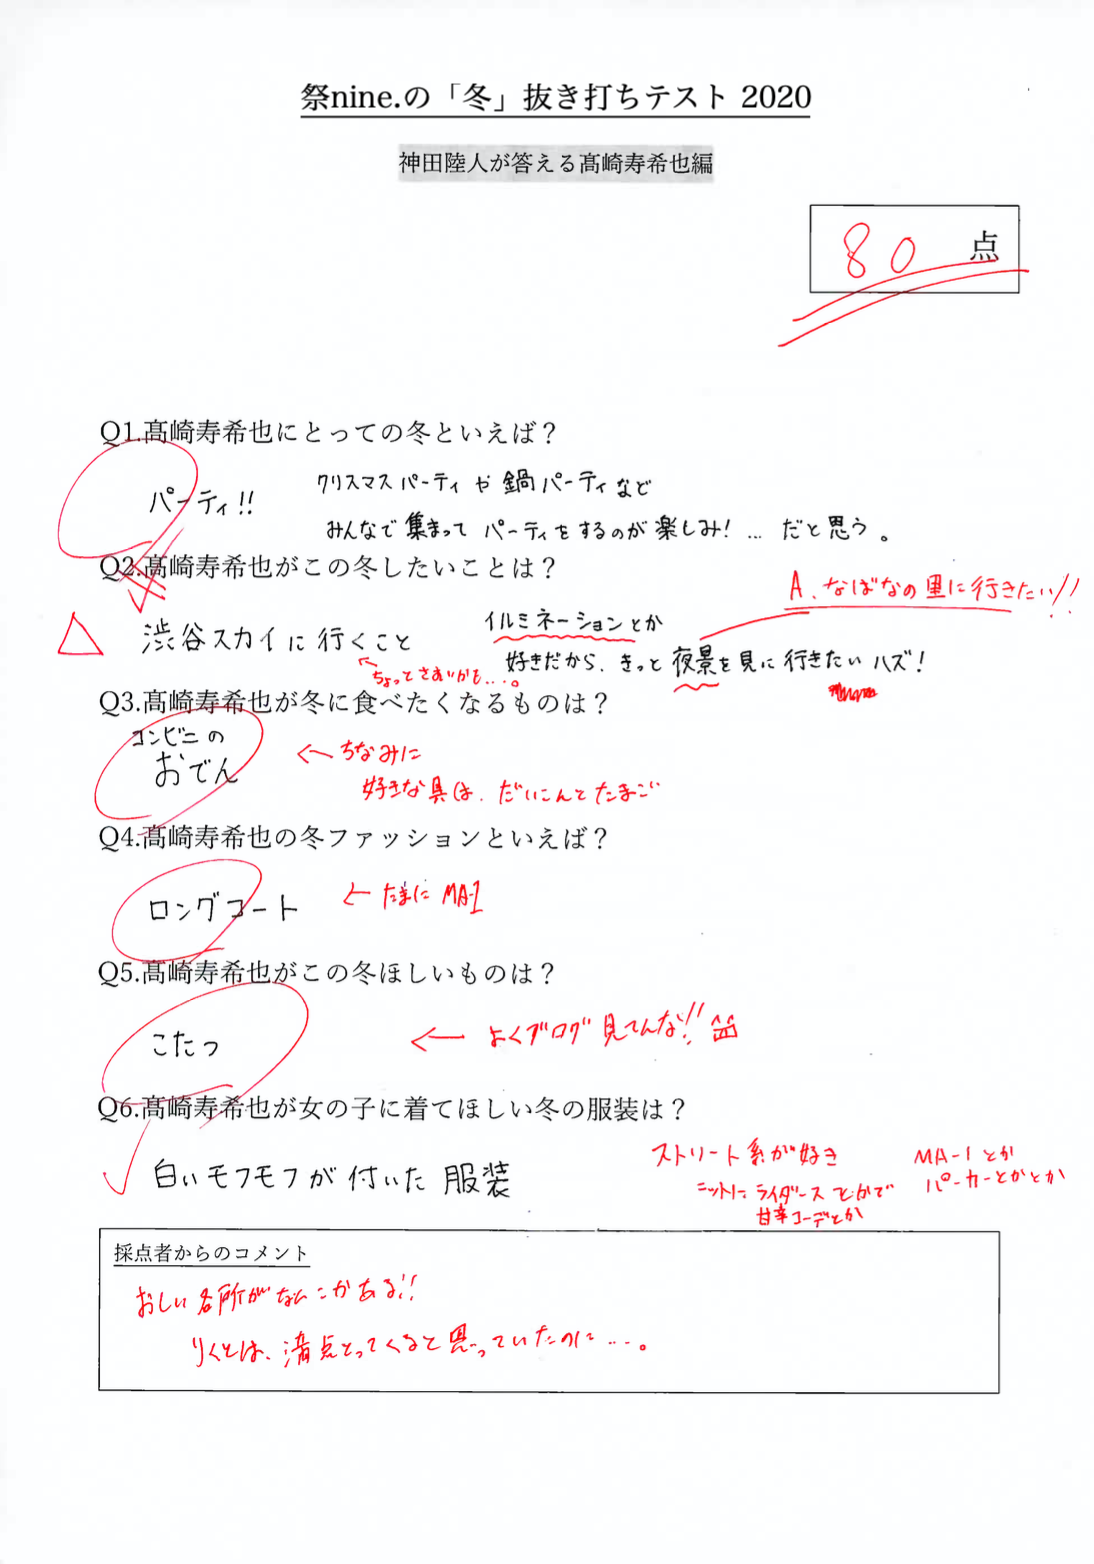 CanCam 祭nine. 轟け、獅子太鼓 寺坂頼我 神田陸人 抜き打ちテスト